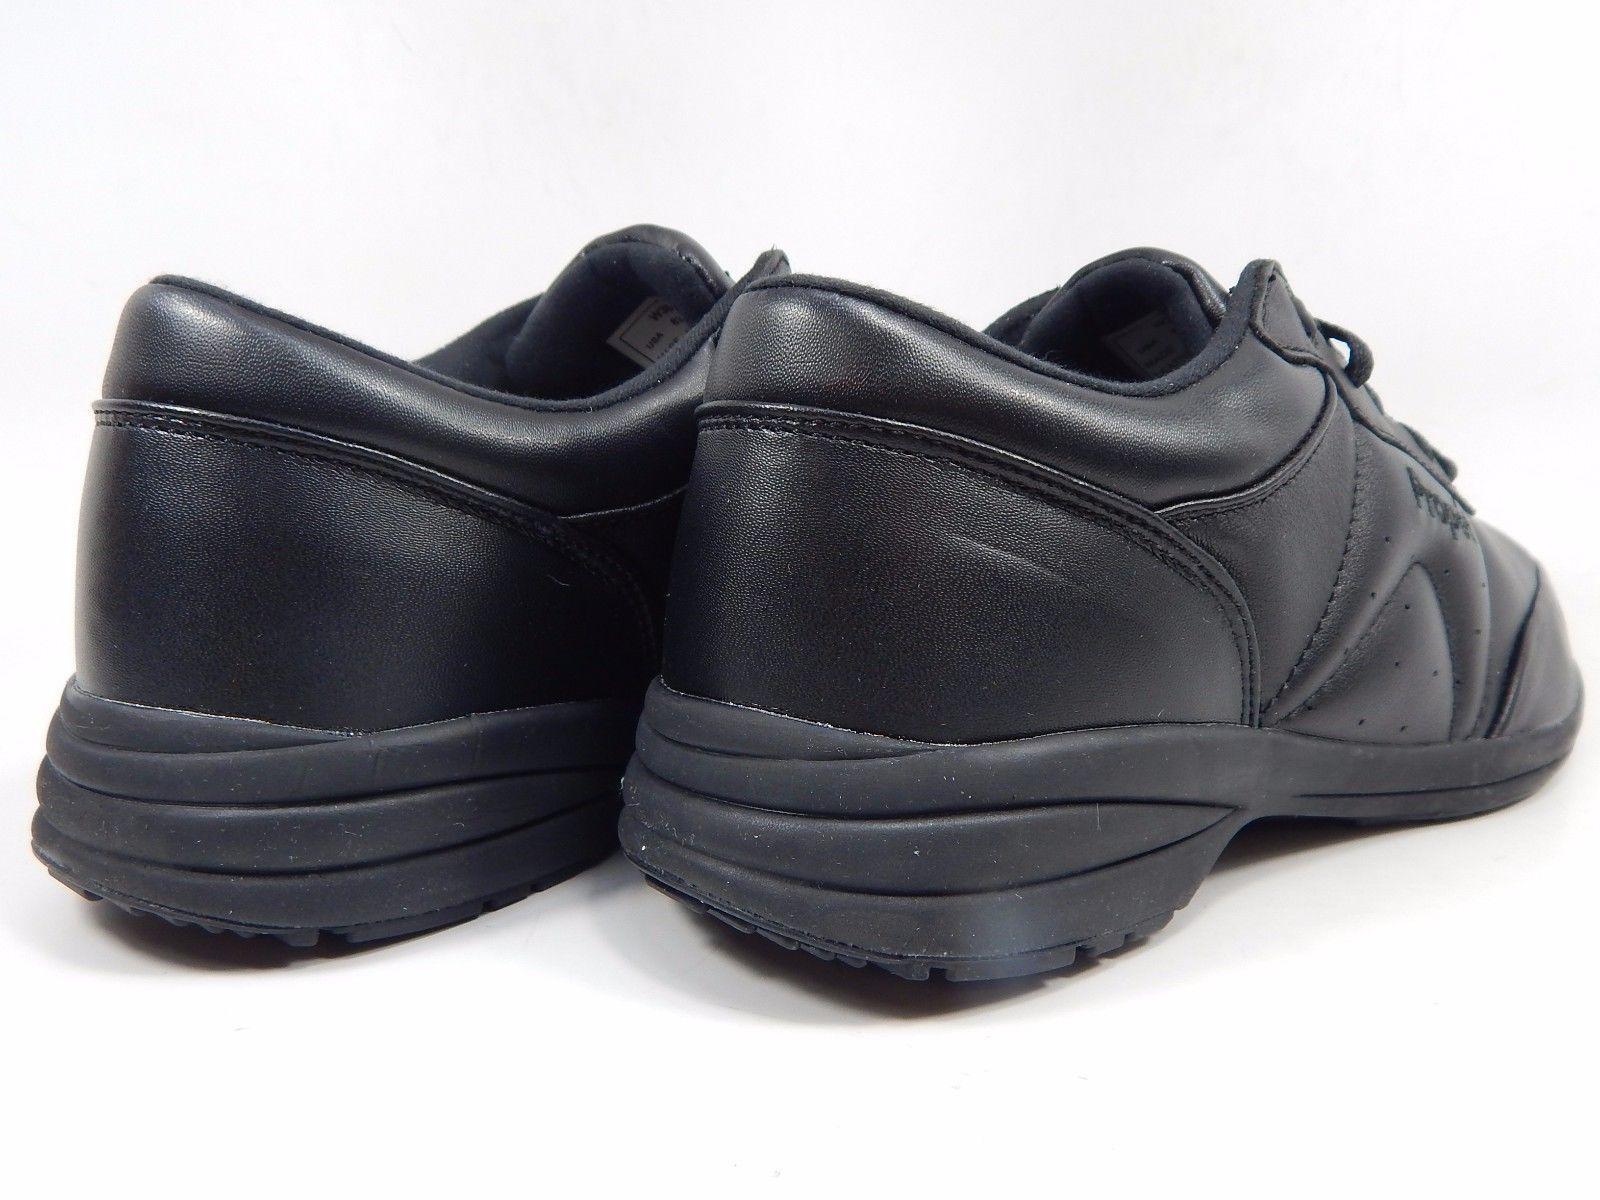 Propet Washable Walker Women's Leather Walking Shoes Size 8 D (W) WIDE Black